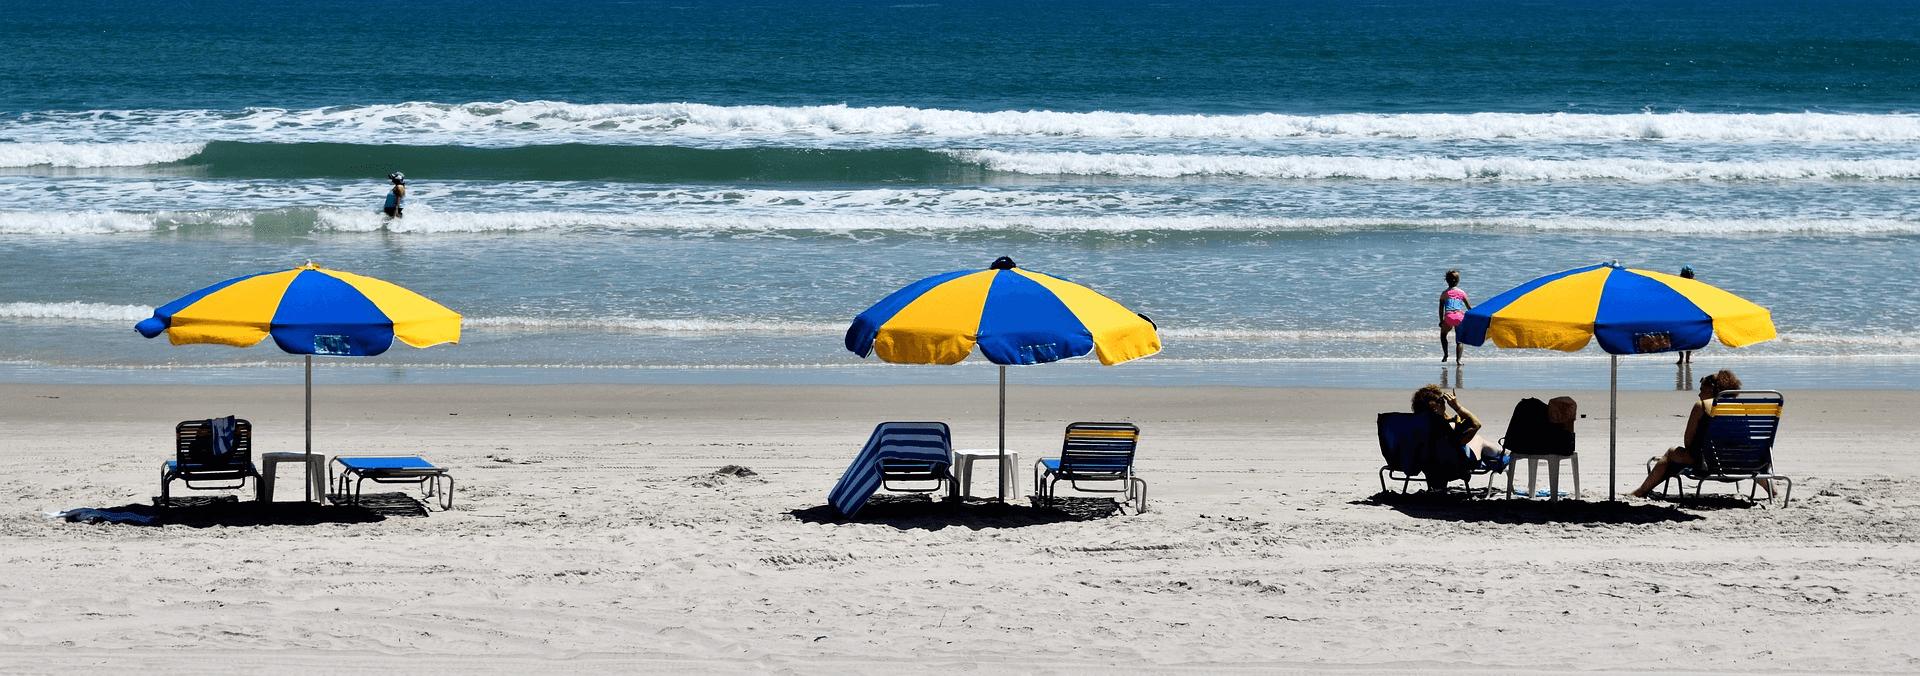 Cheap Things To Do In Daytona Beach